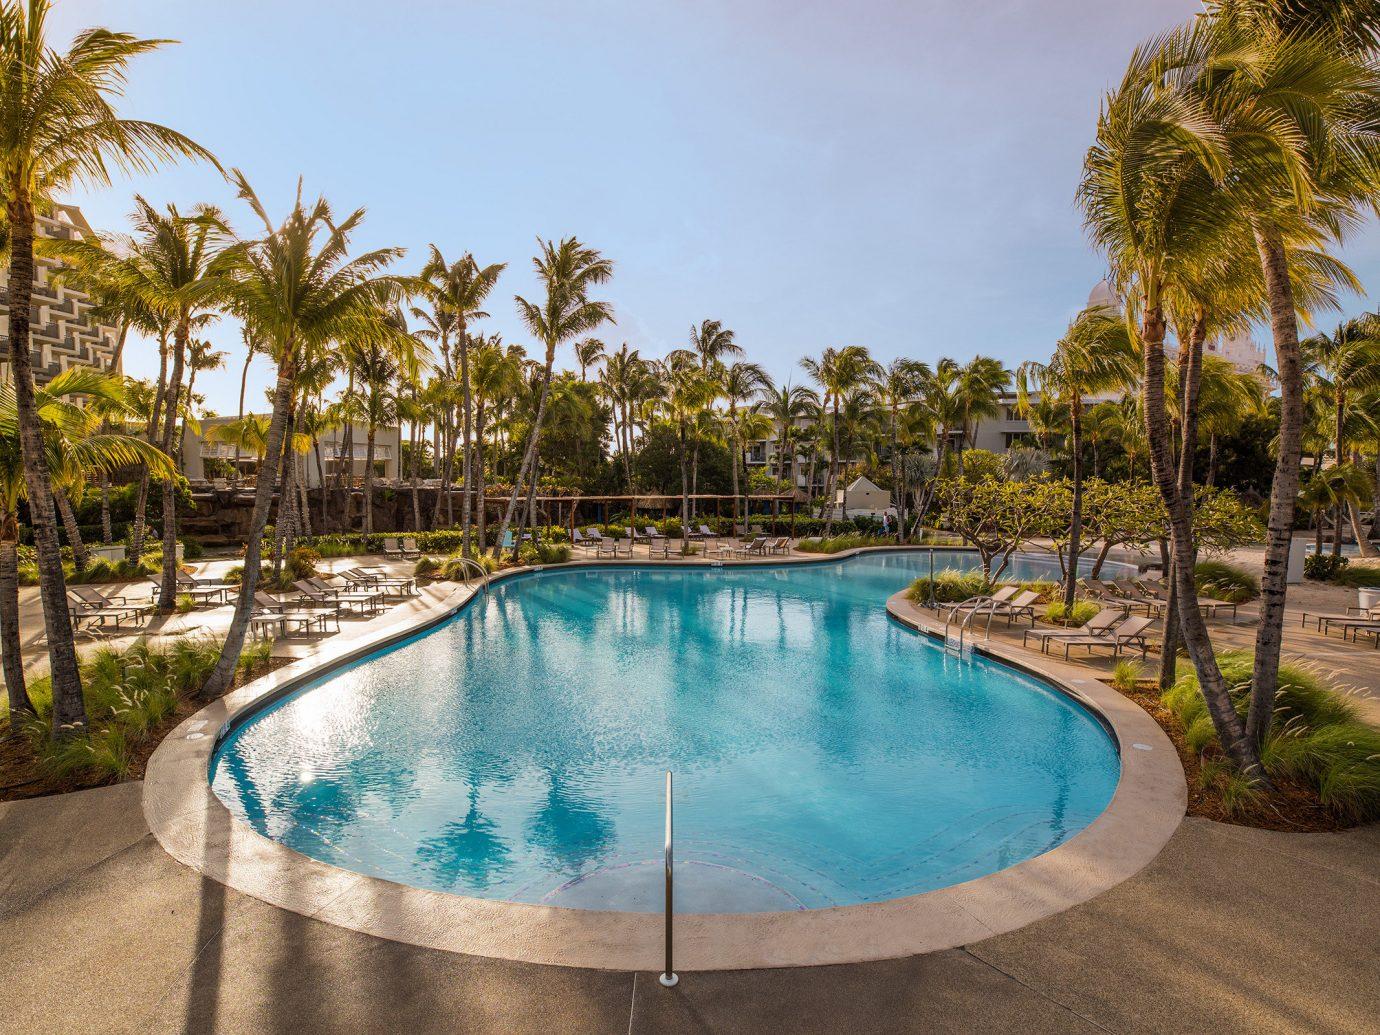 Aruba caribbean Hotels tree outdoor sky palm Pool swimming pool property leisure Resort estate vacation Villa real estate backyard Lagoon arecales lined